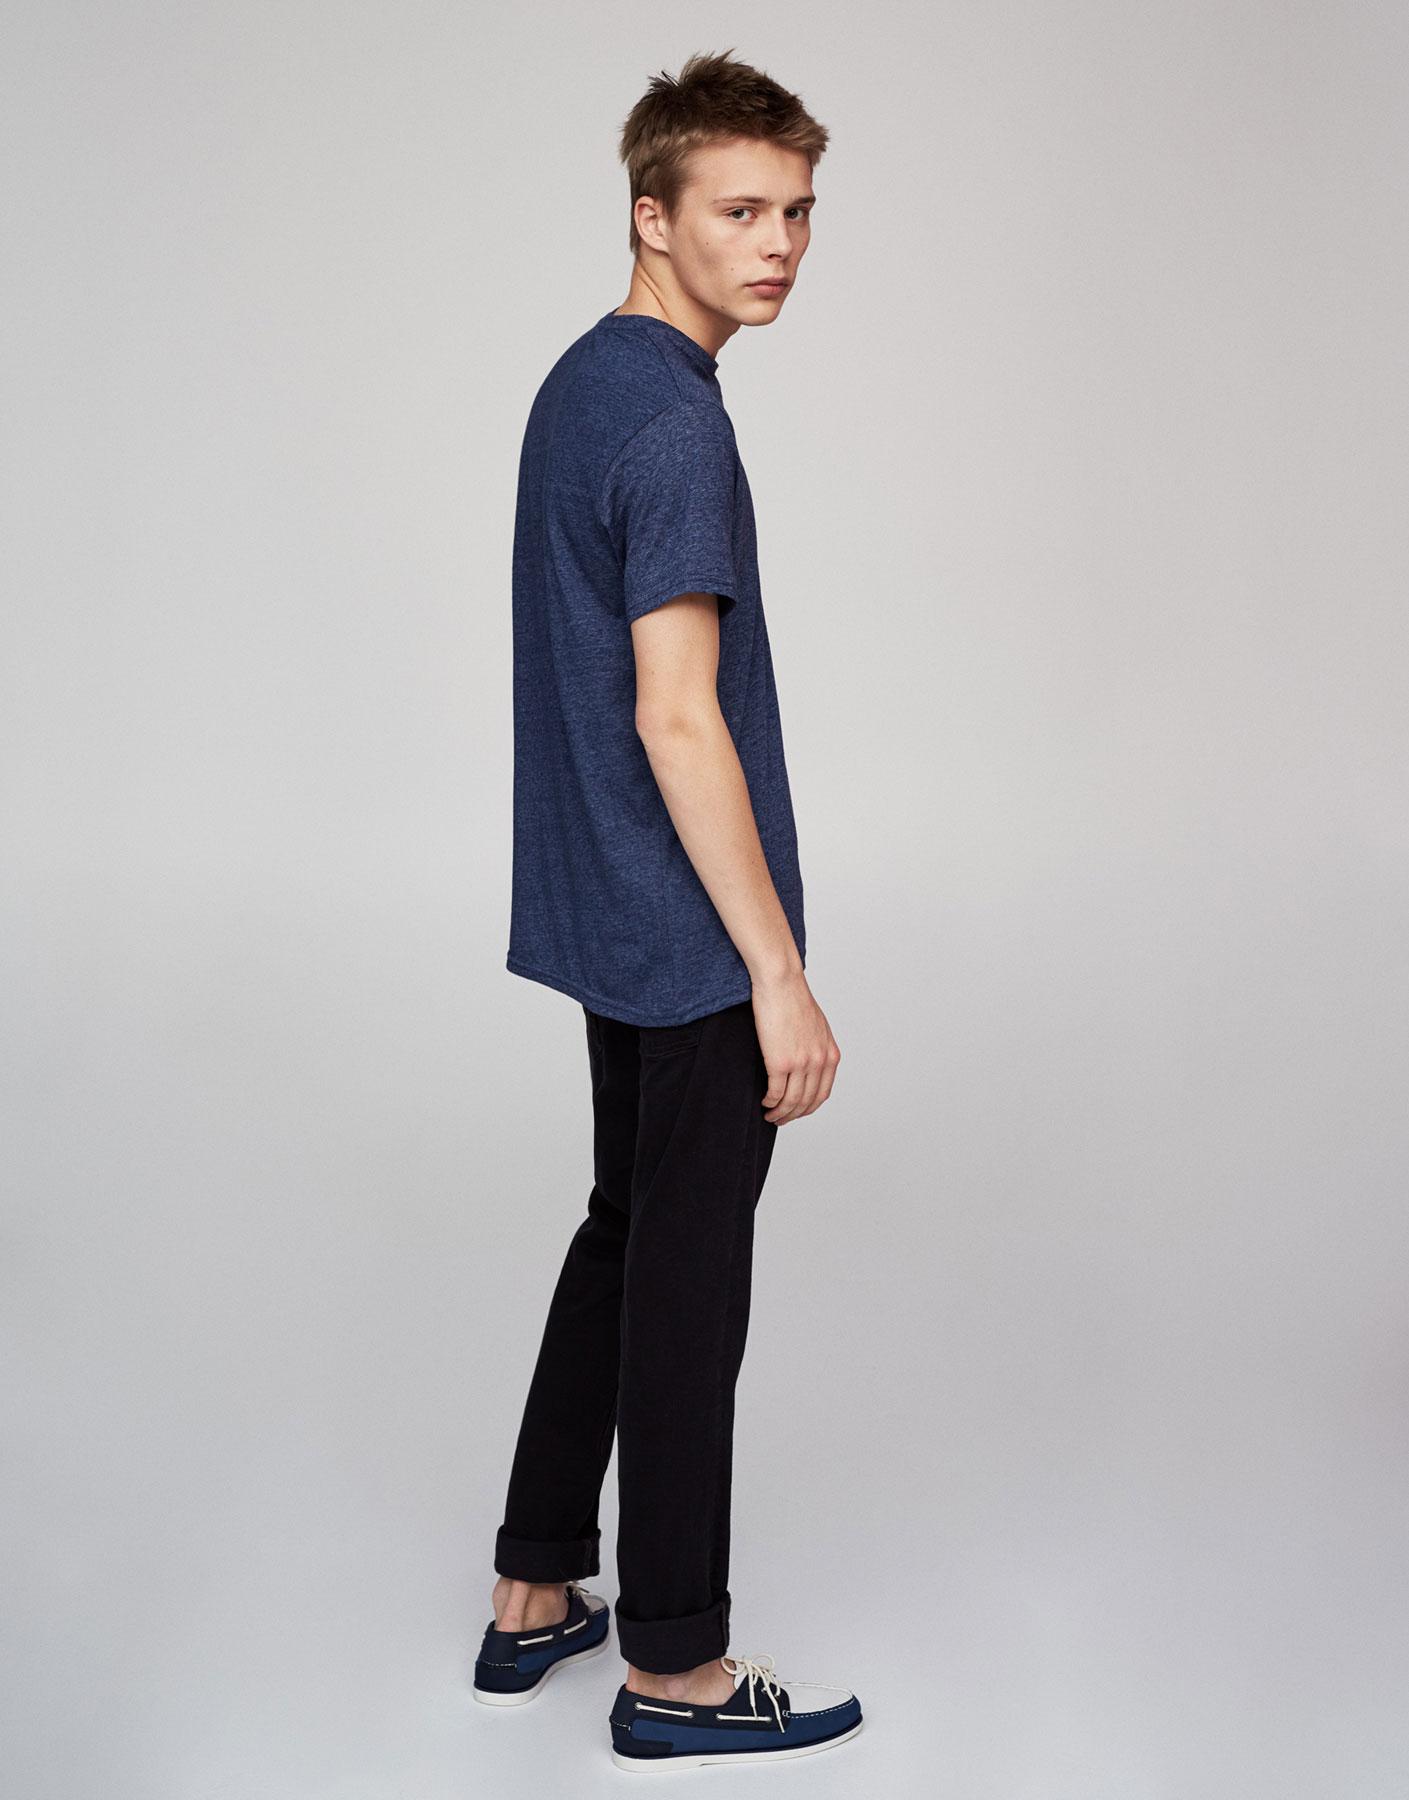 Camiseta tipo lino black